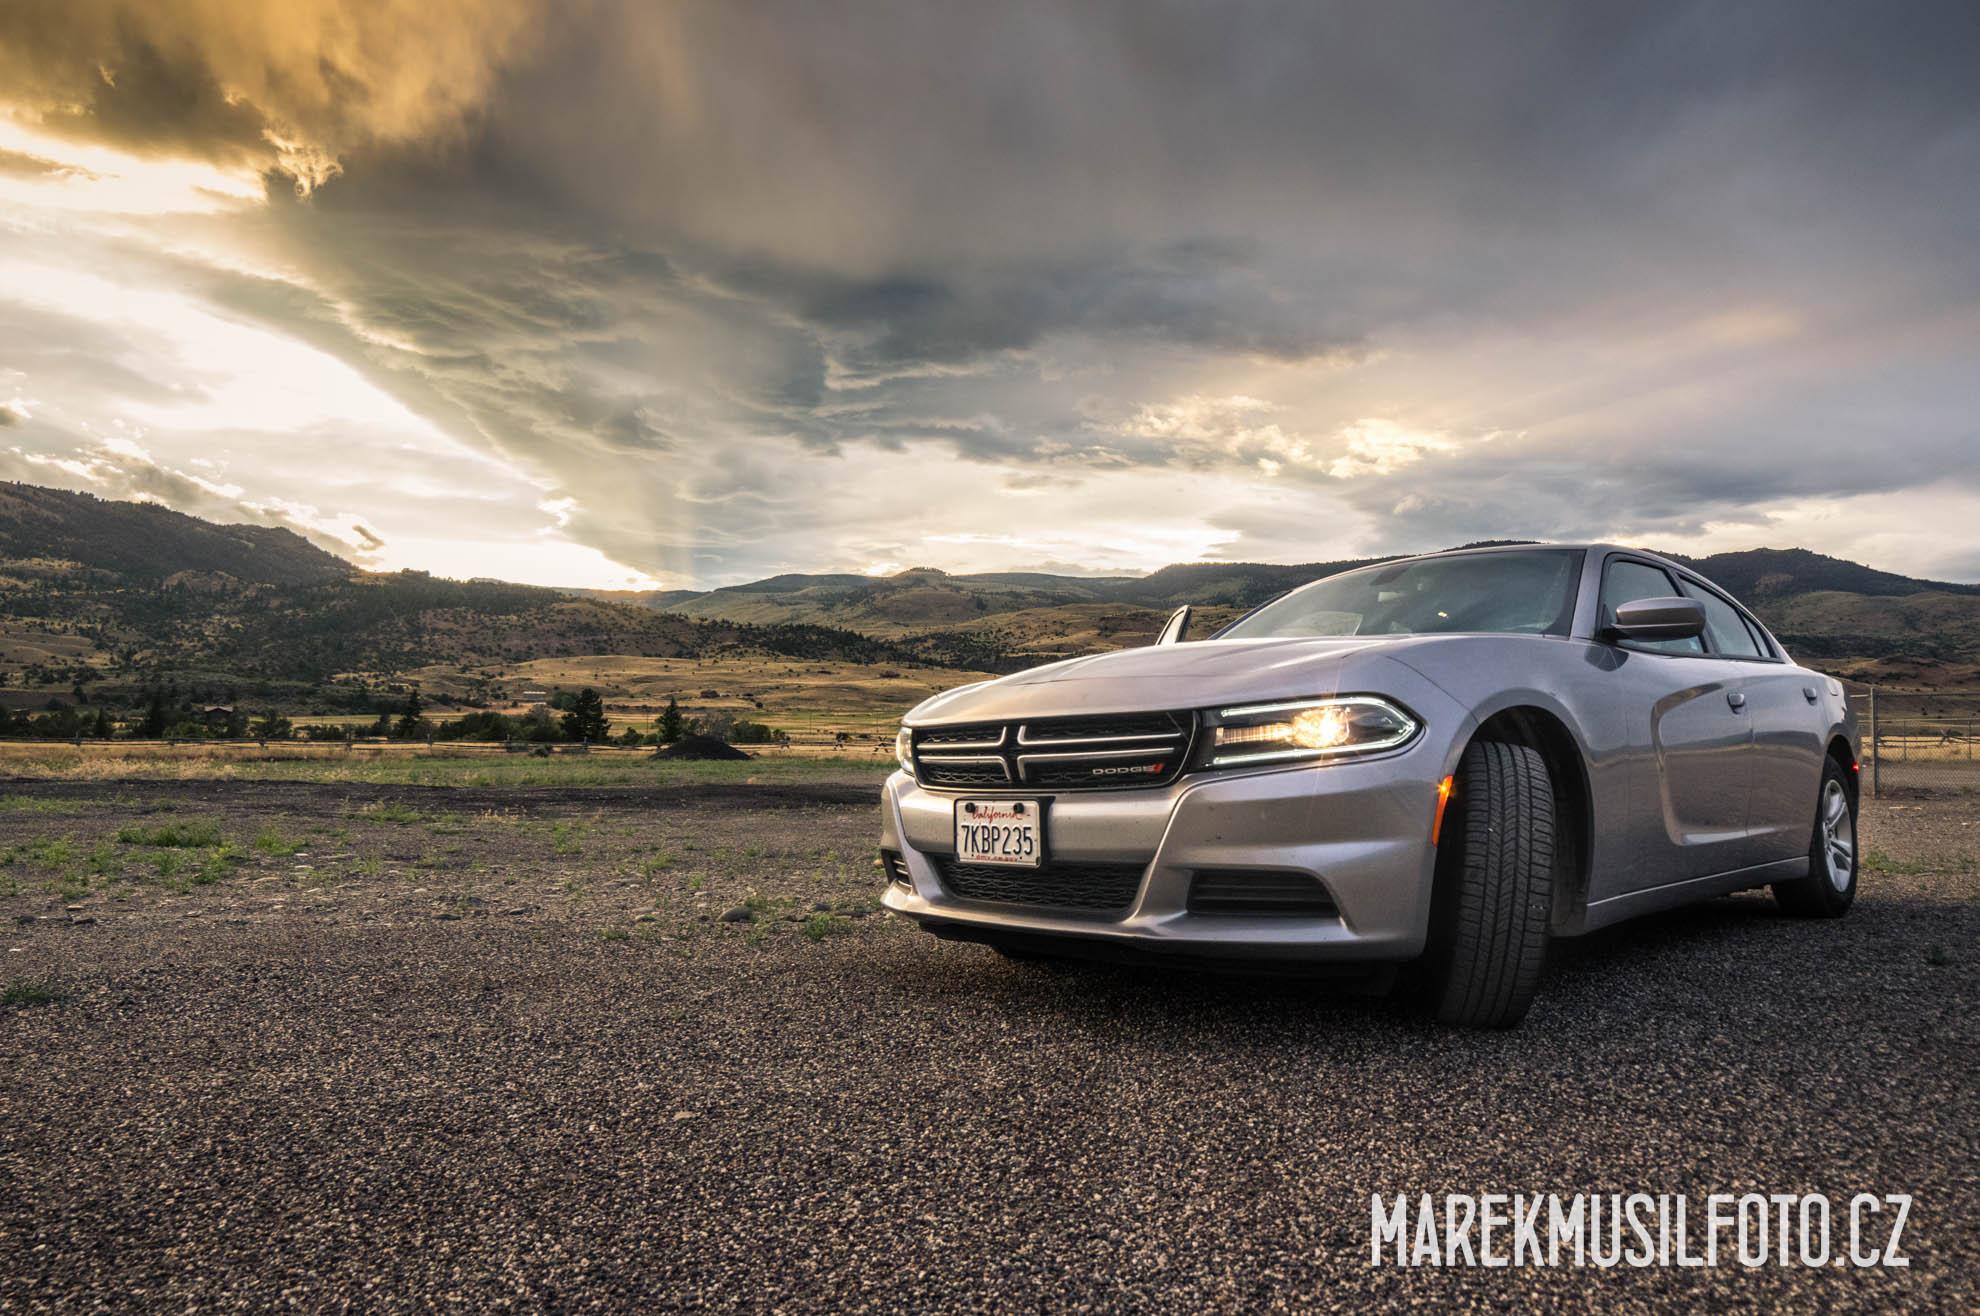 Cesta po USA - Yellowstone sunset